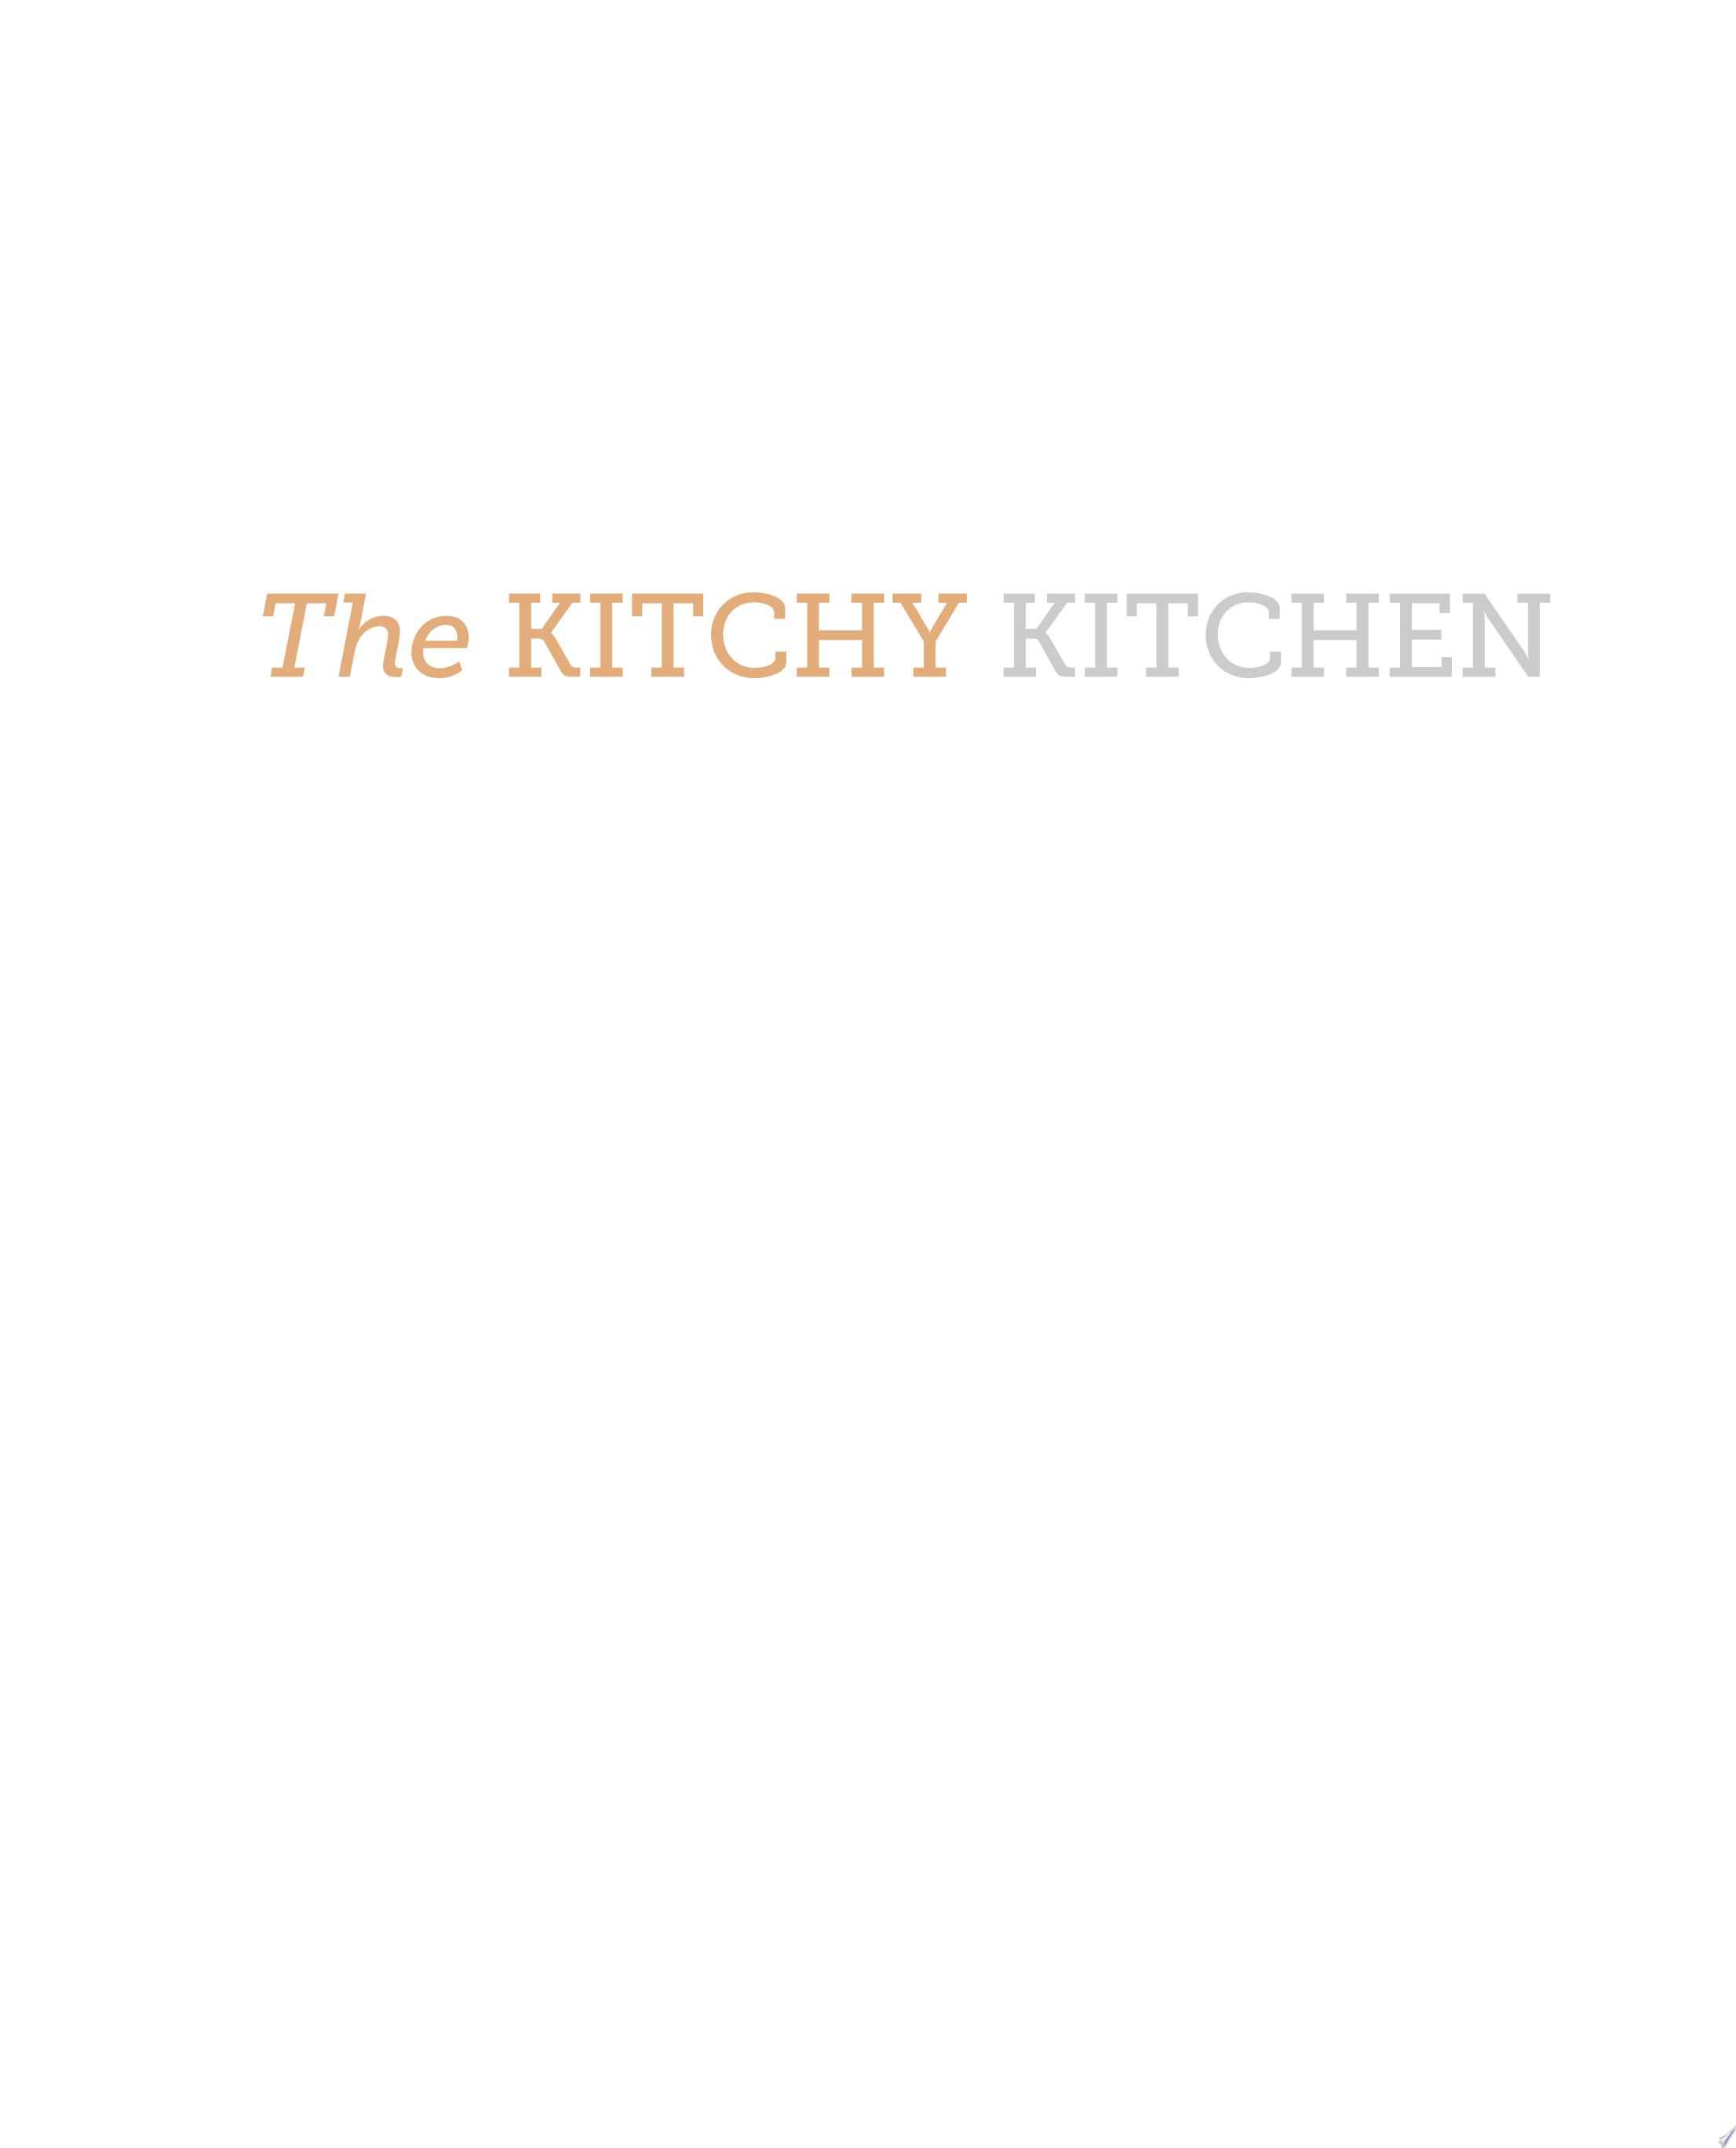 The Kitchy Kitchen